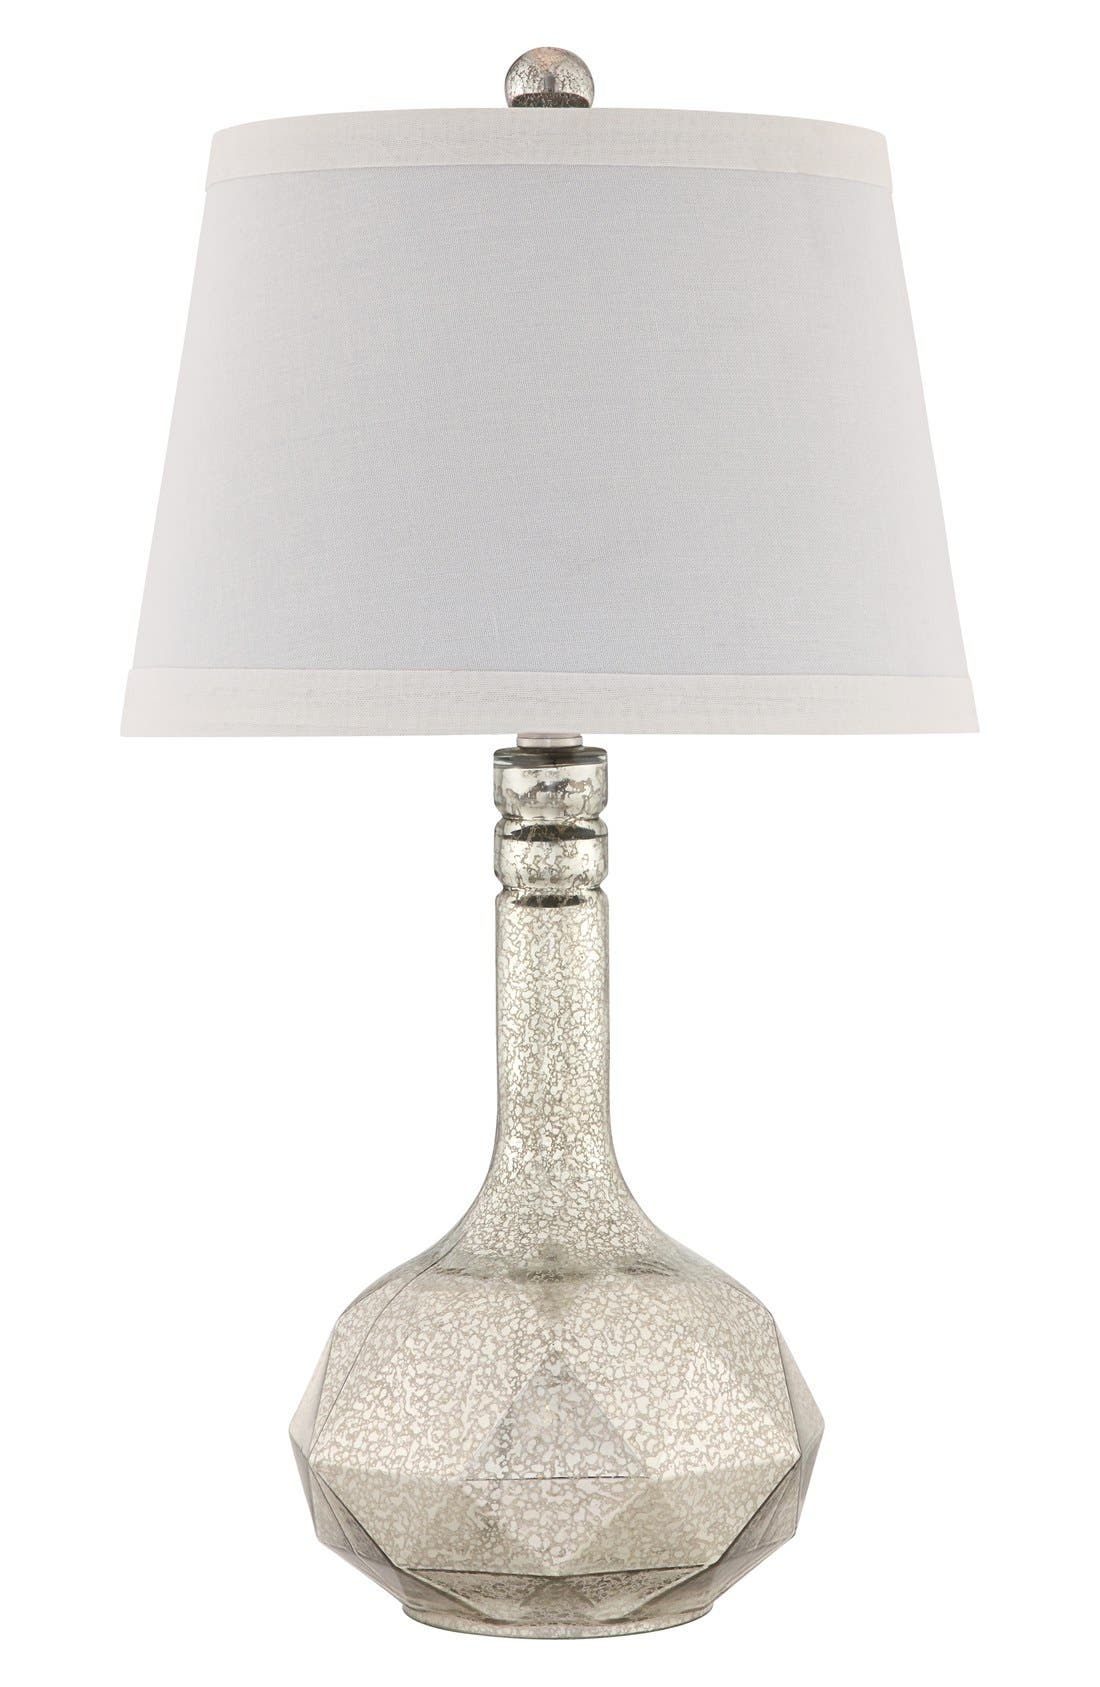 Main Image - JAlexander Lighting Mercury Glass Table Lamp